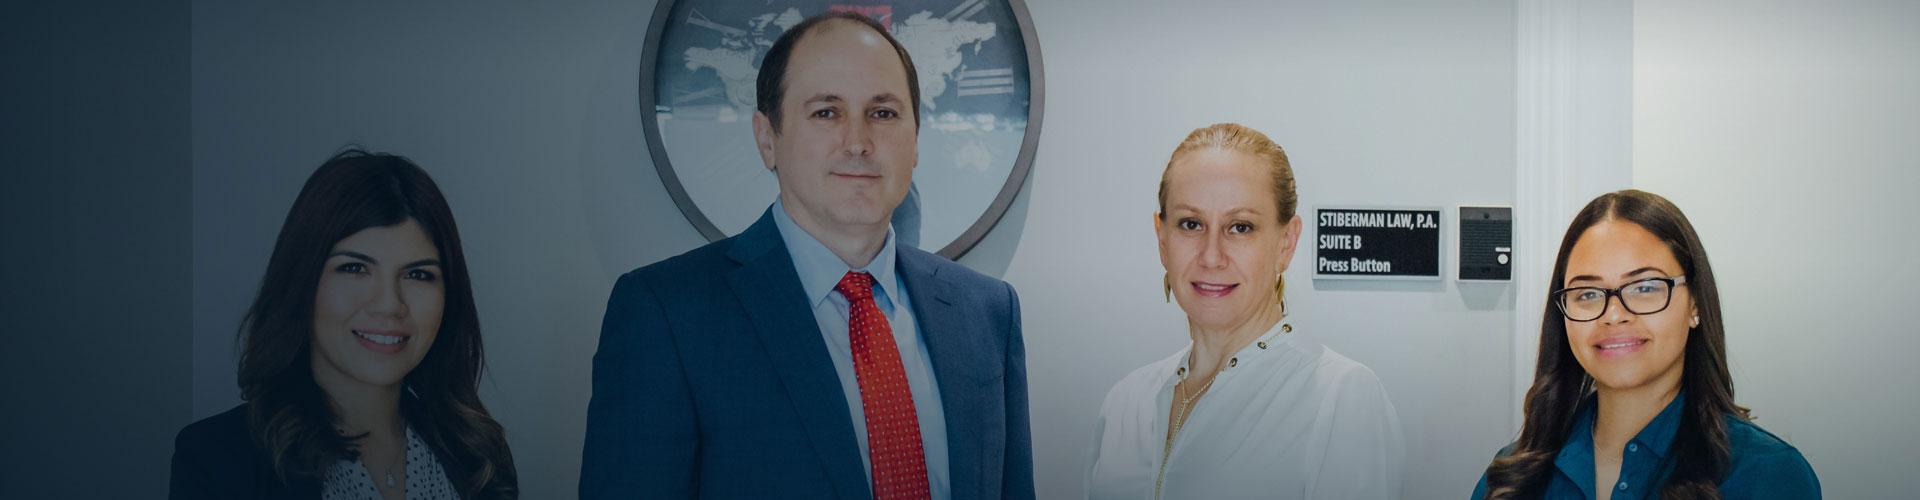 Miami Loan Modification Attorneys - Stiberman Law Firm